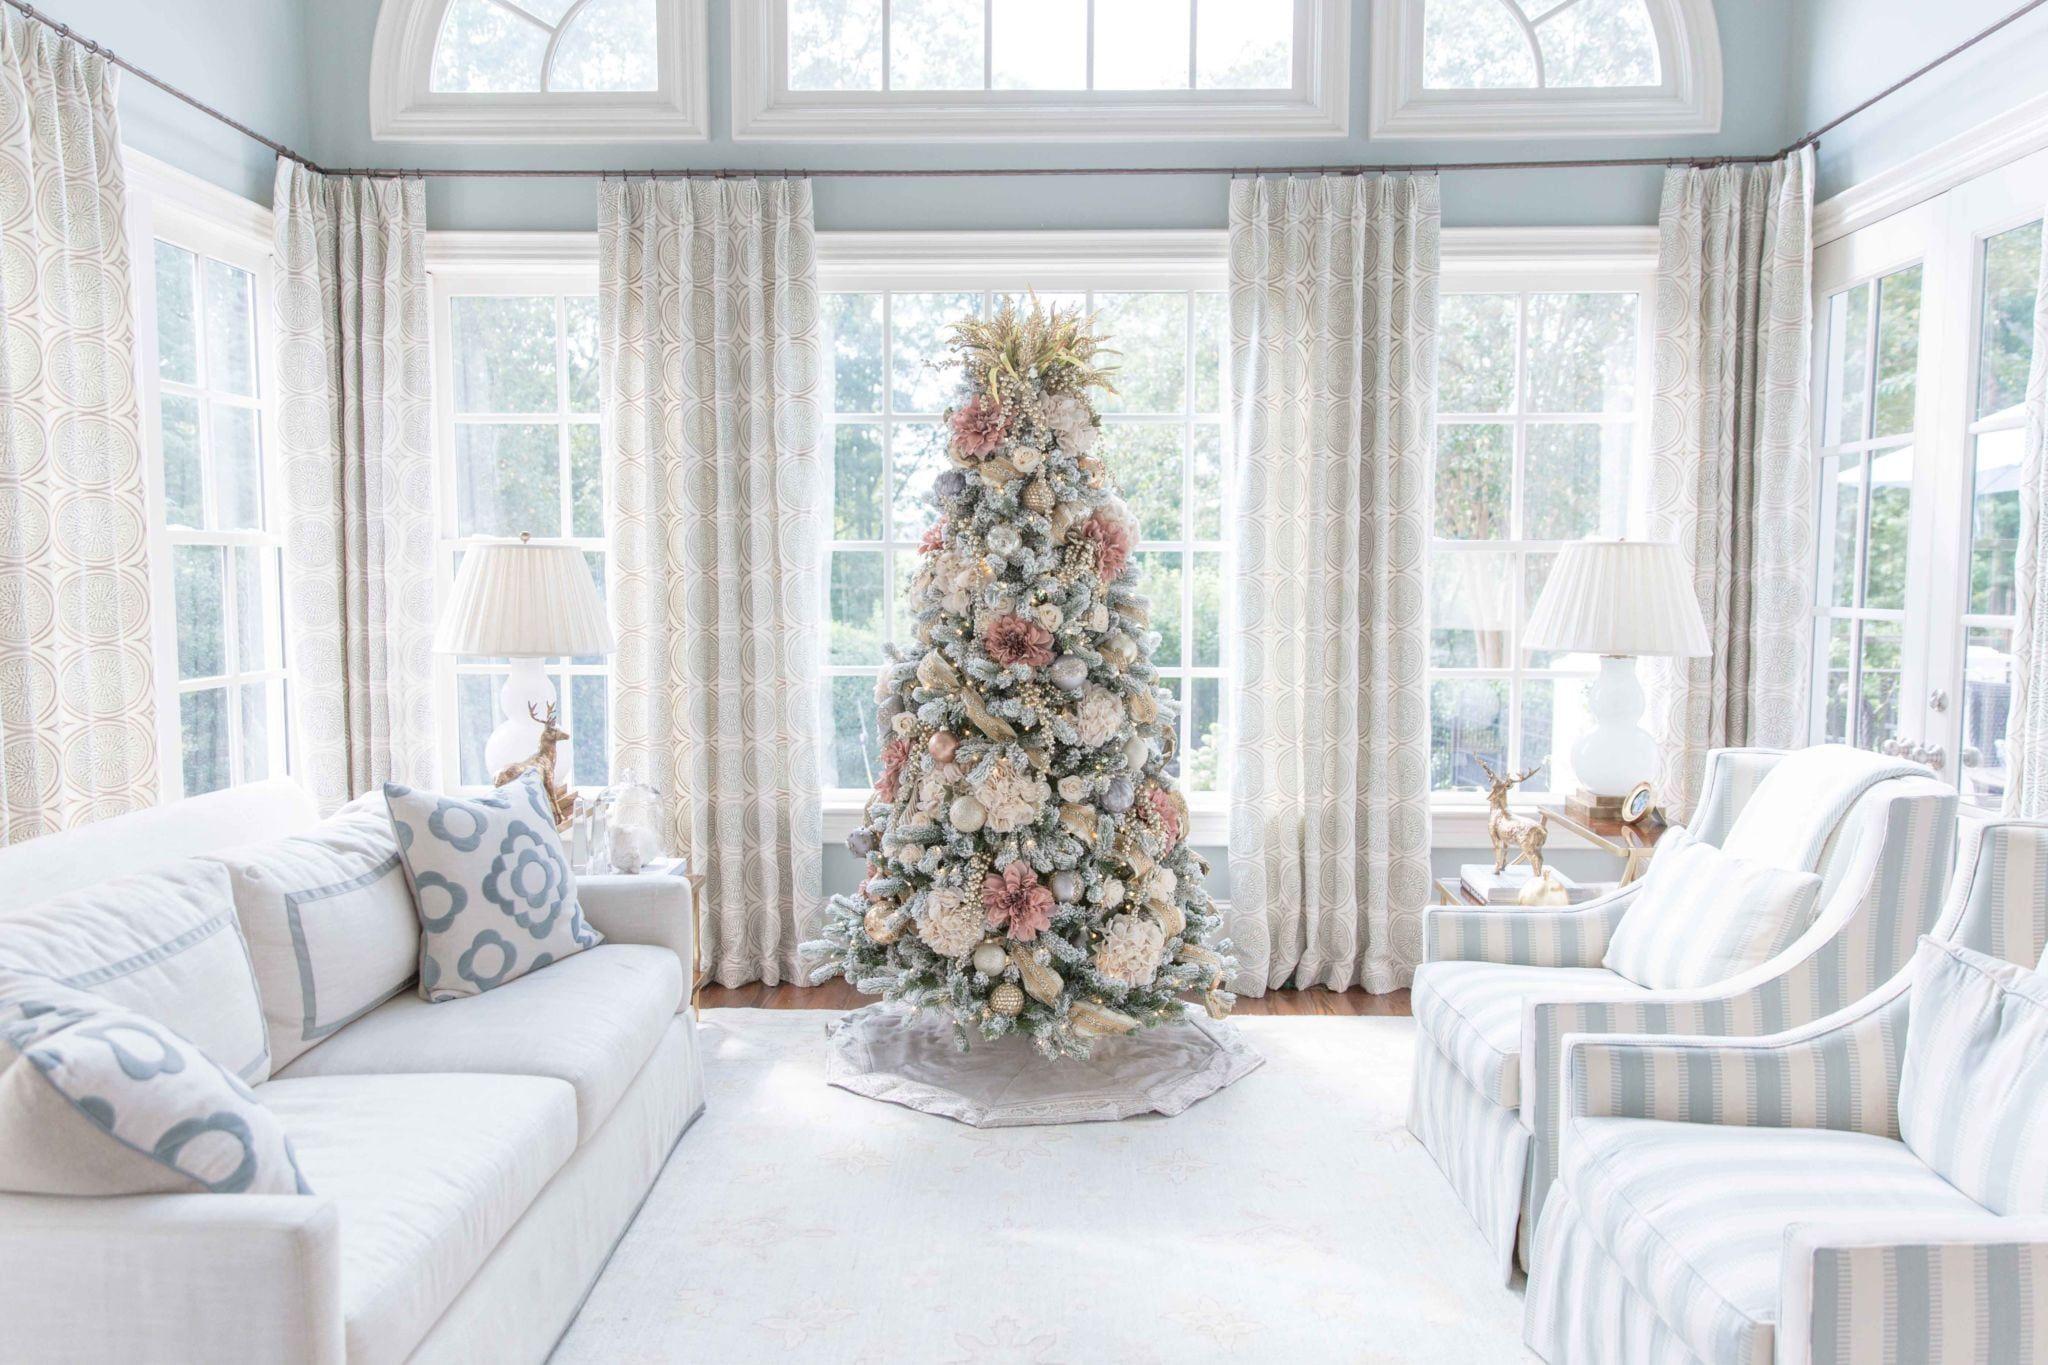 e Elegant Christmas Tree Decorated Two Ways